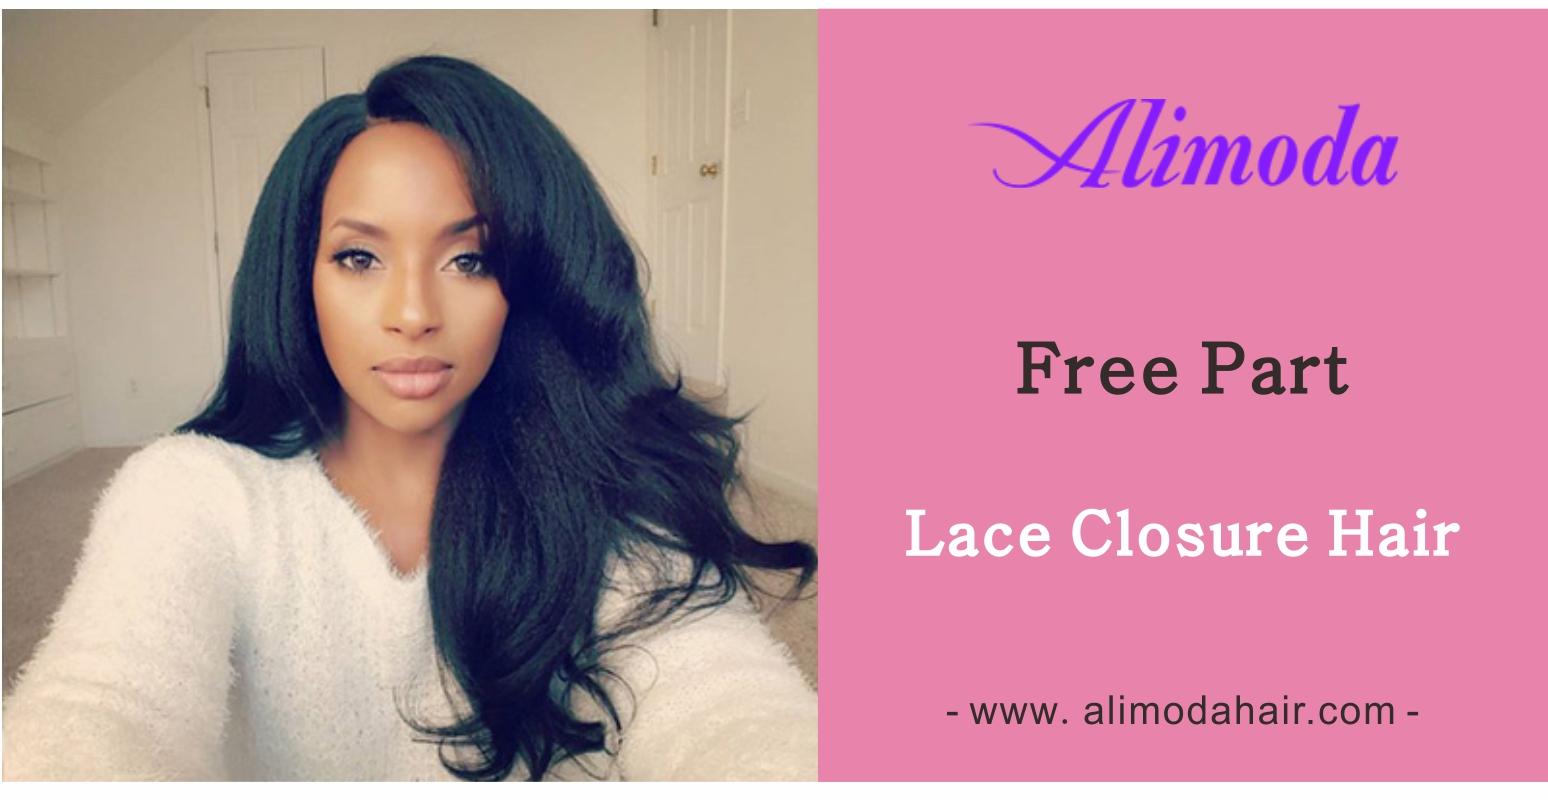 free part lace closure hair